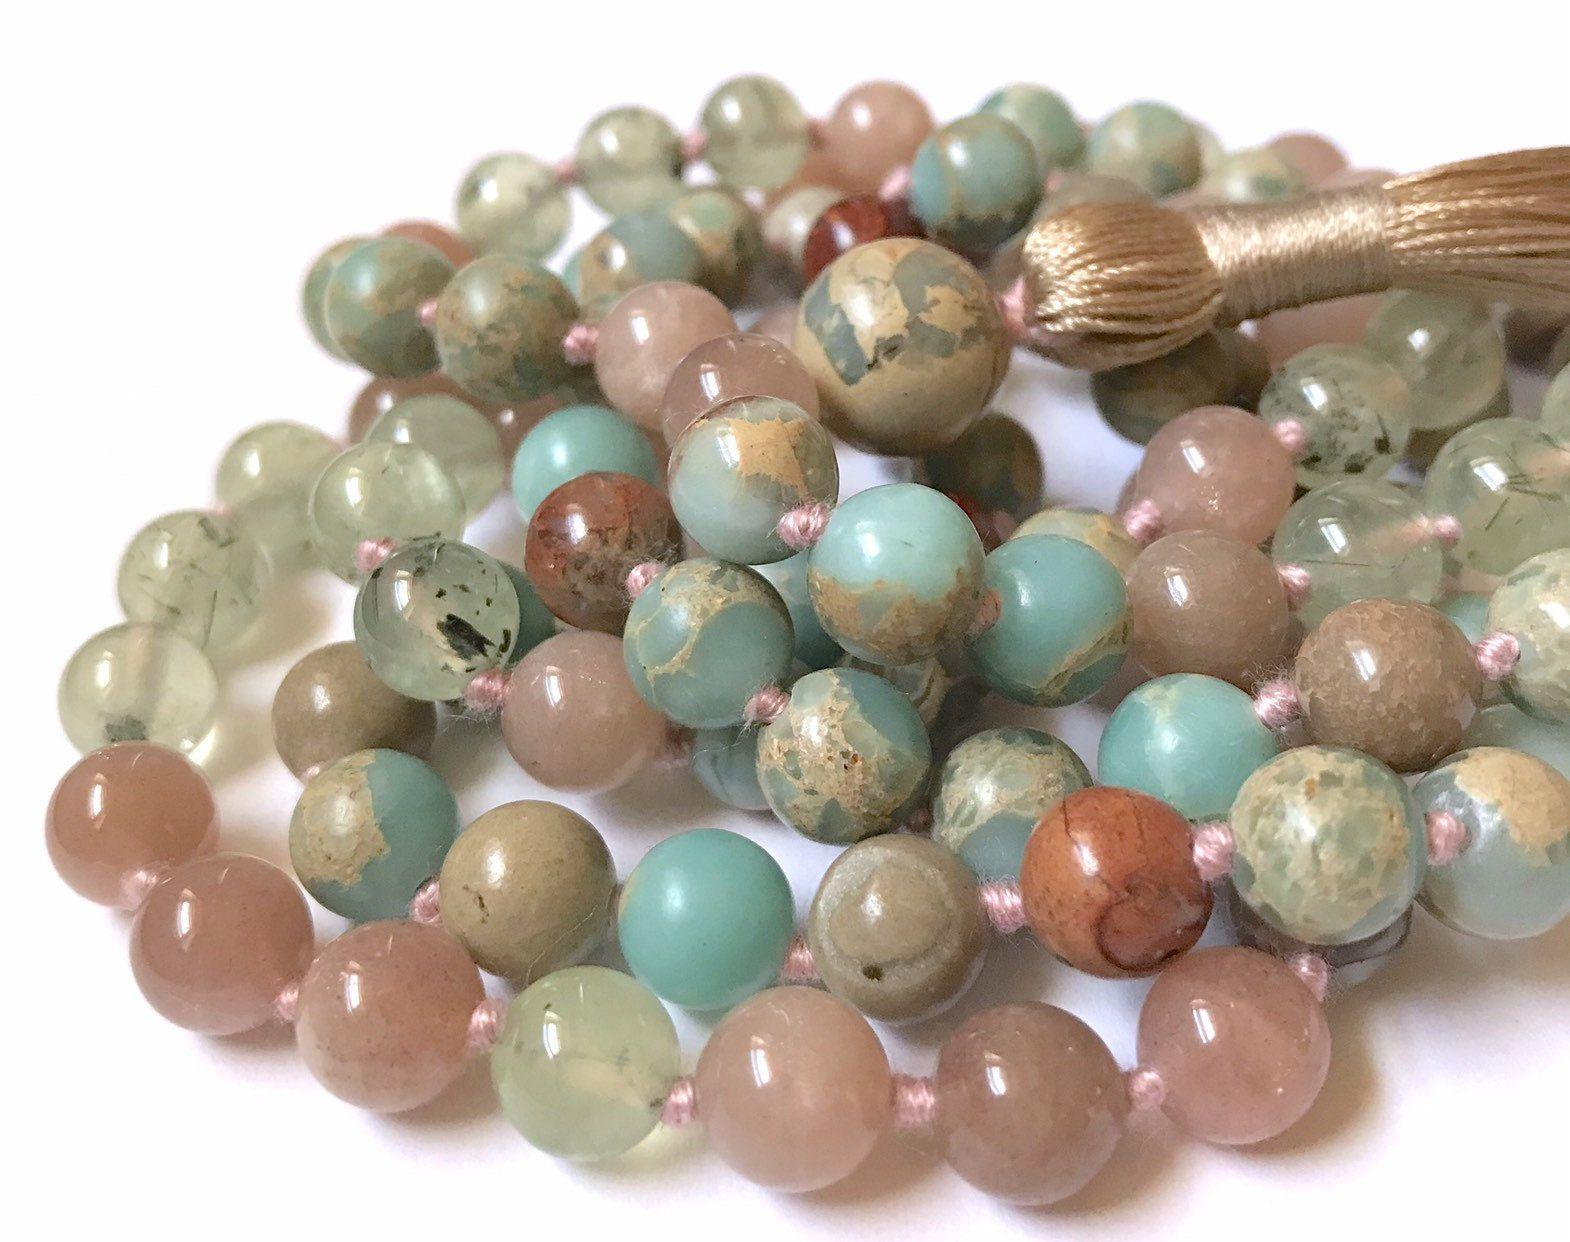 African Opal Aura Terra Jasper Mala Necklace Prehnite 108 Mala Beads Meditation MalaYoga Jewelry